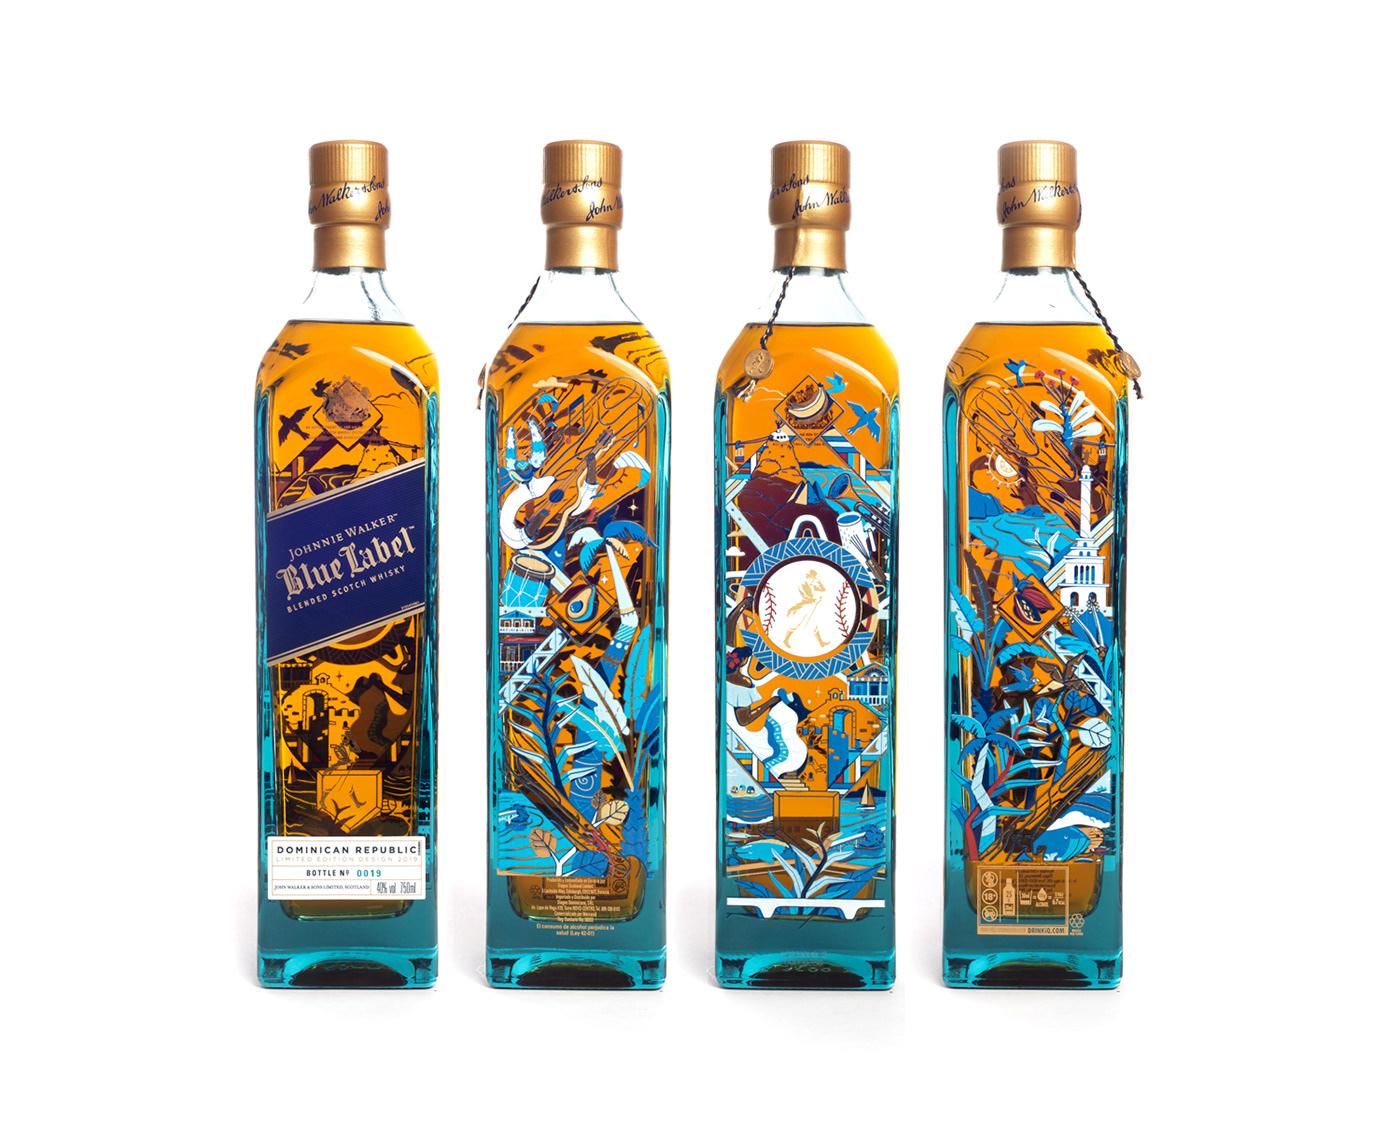 4 views of the Johnnie Walker Bottle